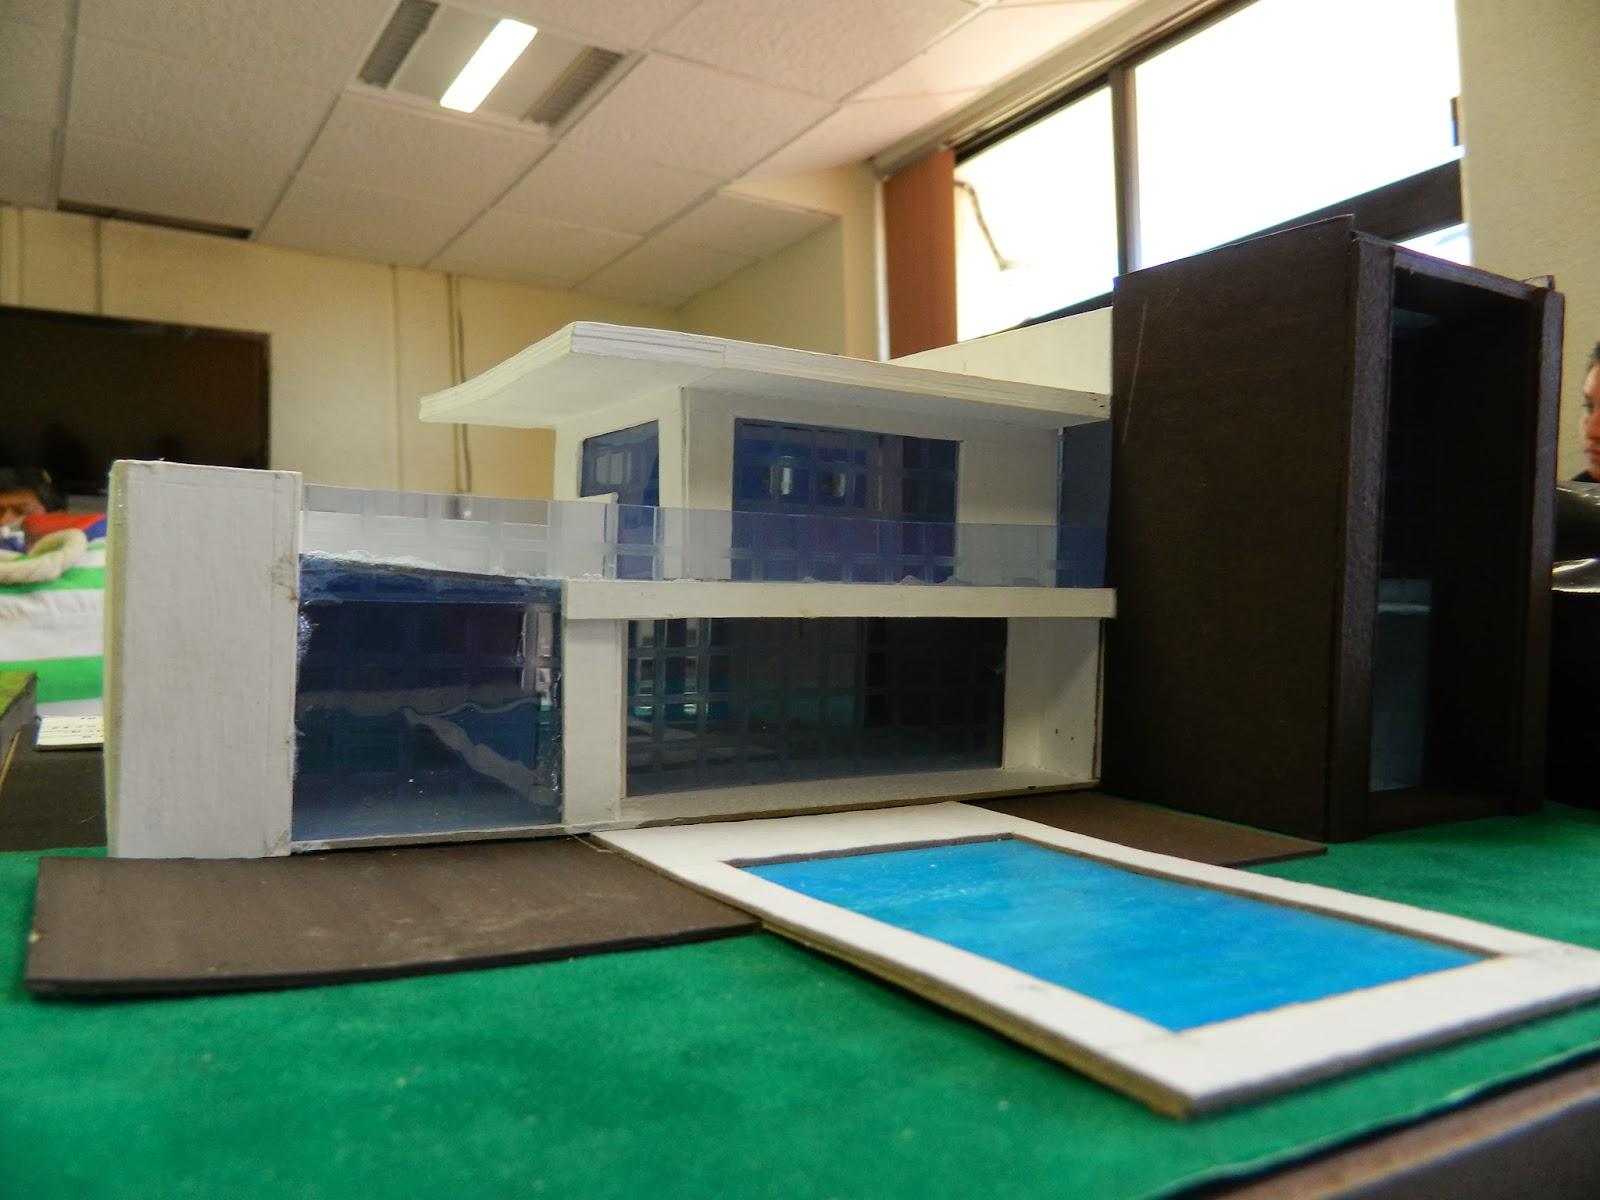 Tesvg actividades de arquitectura for Carreras de arquitectura